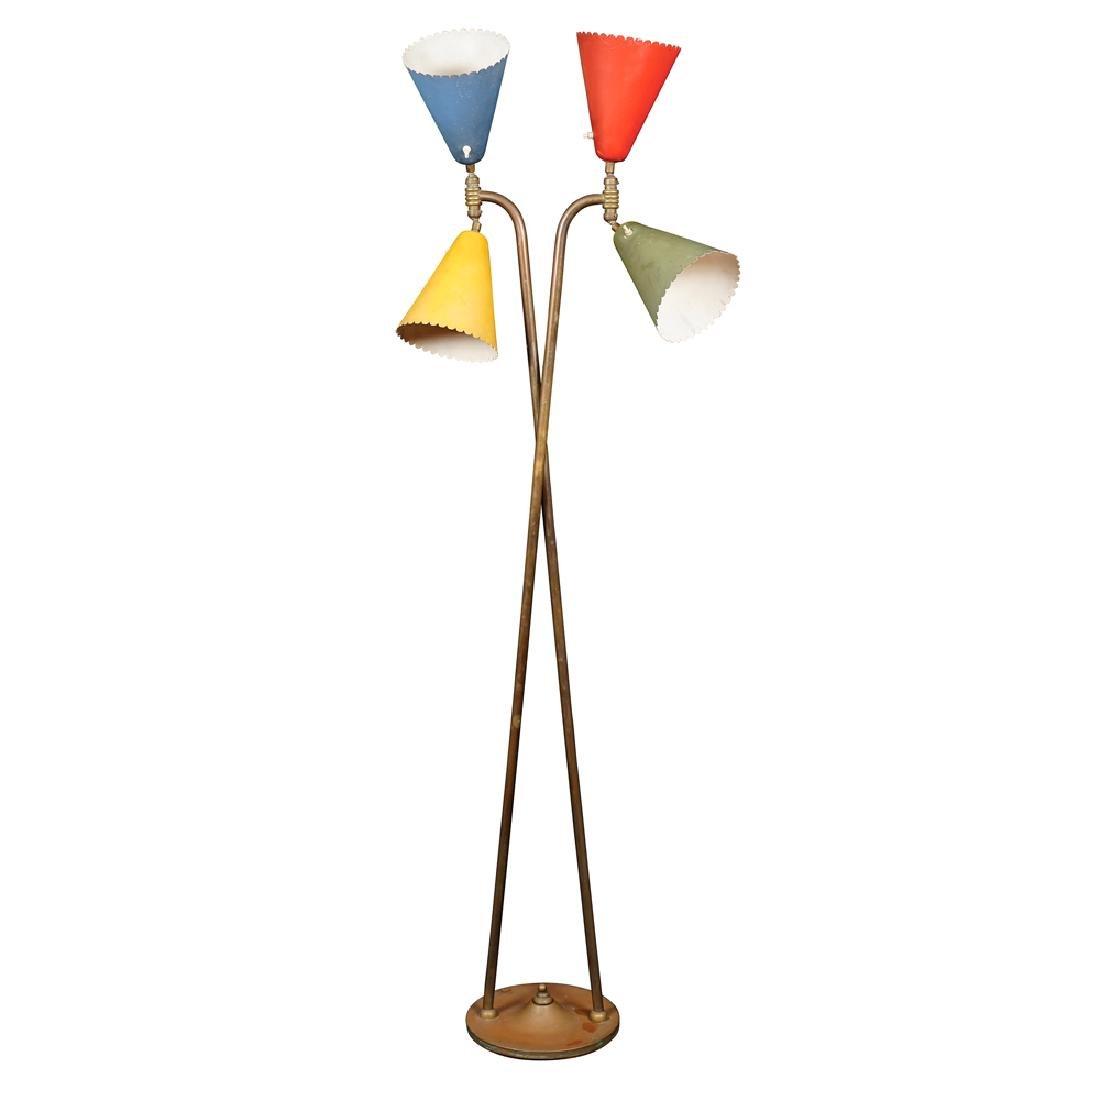 Floor lamp Stilnovo style Italy 20th century h. 182 cm.